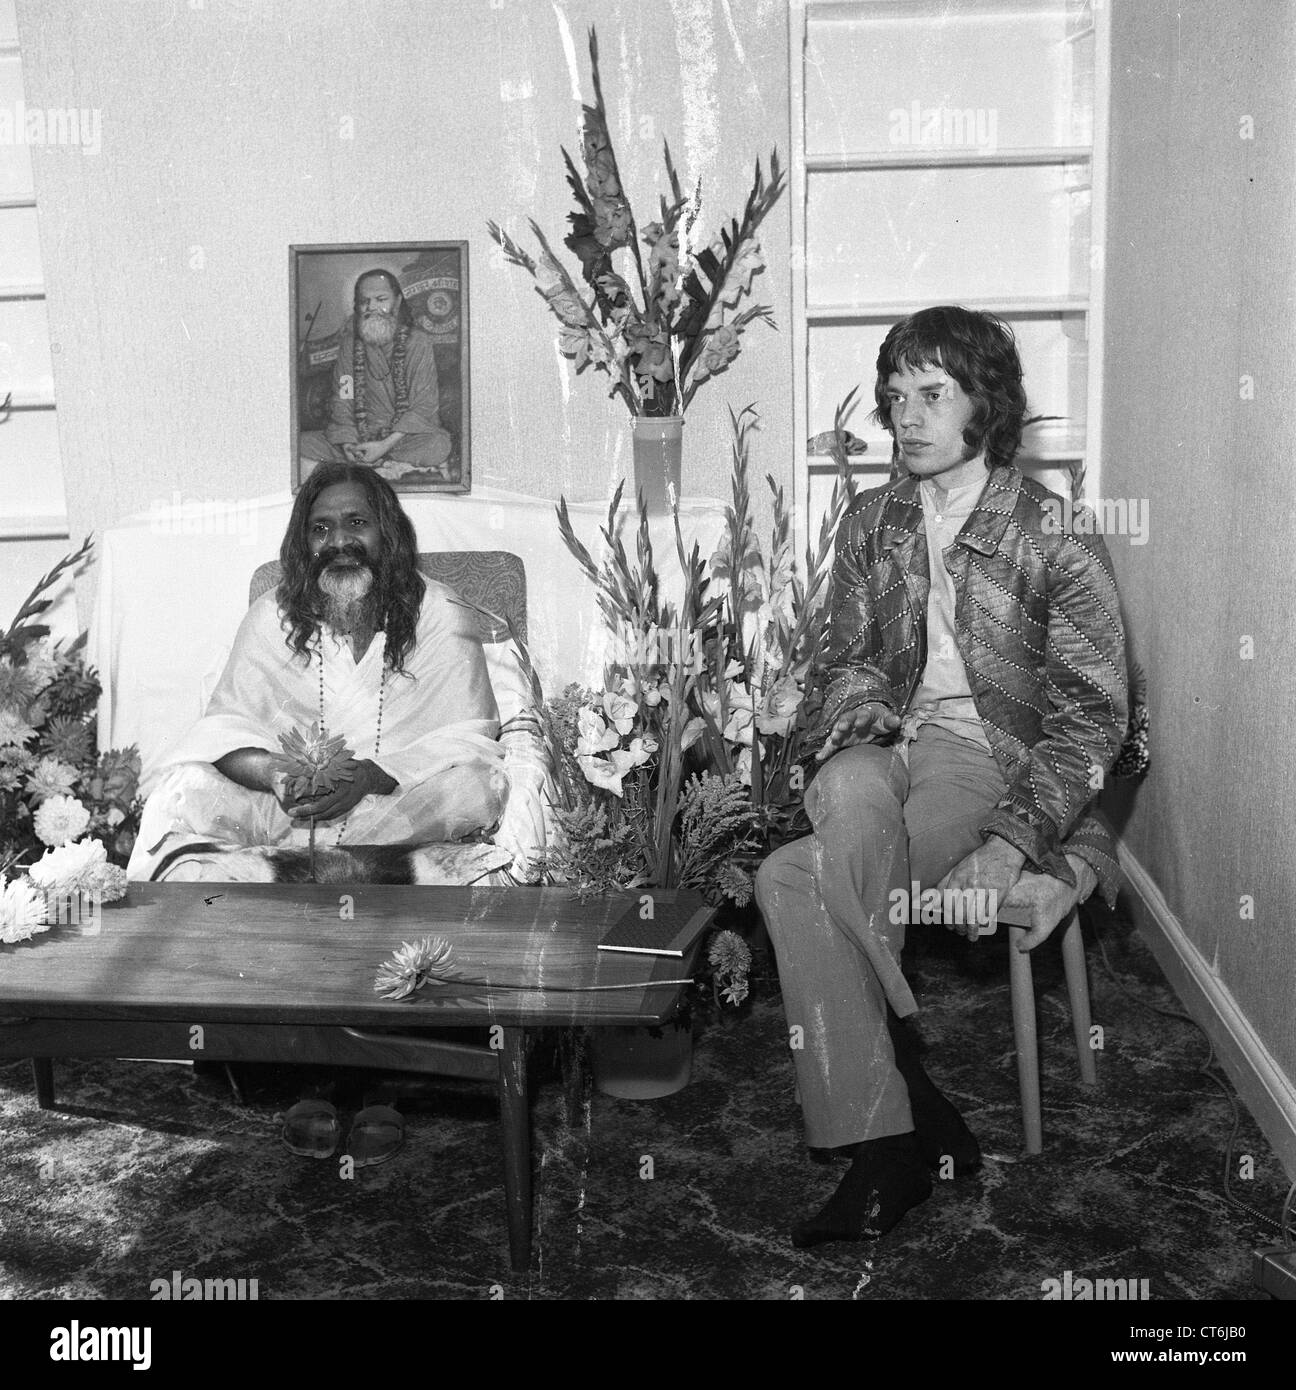 006263 - Mick Jagger & Maharishi Mahesh Yogi in Bangor, North Wales in August 1967 - Stock Image